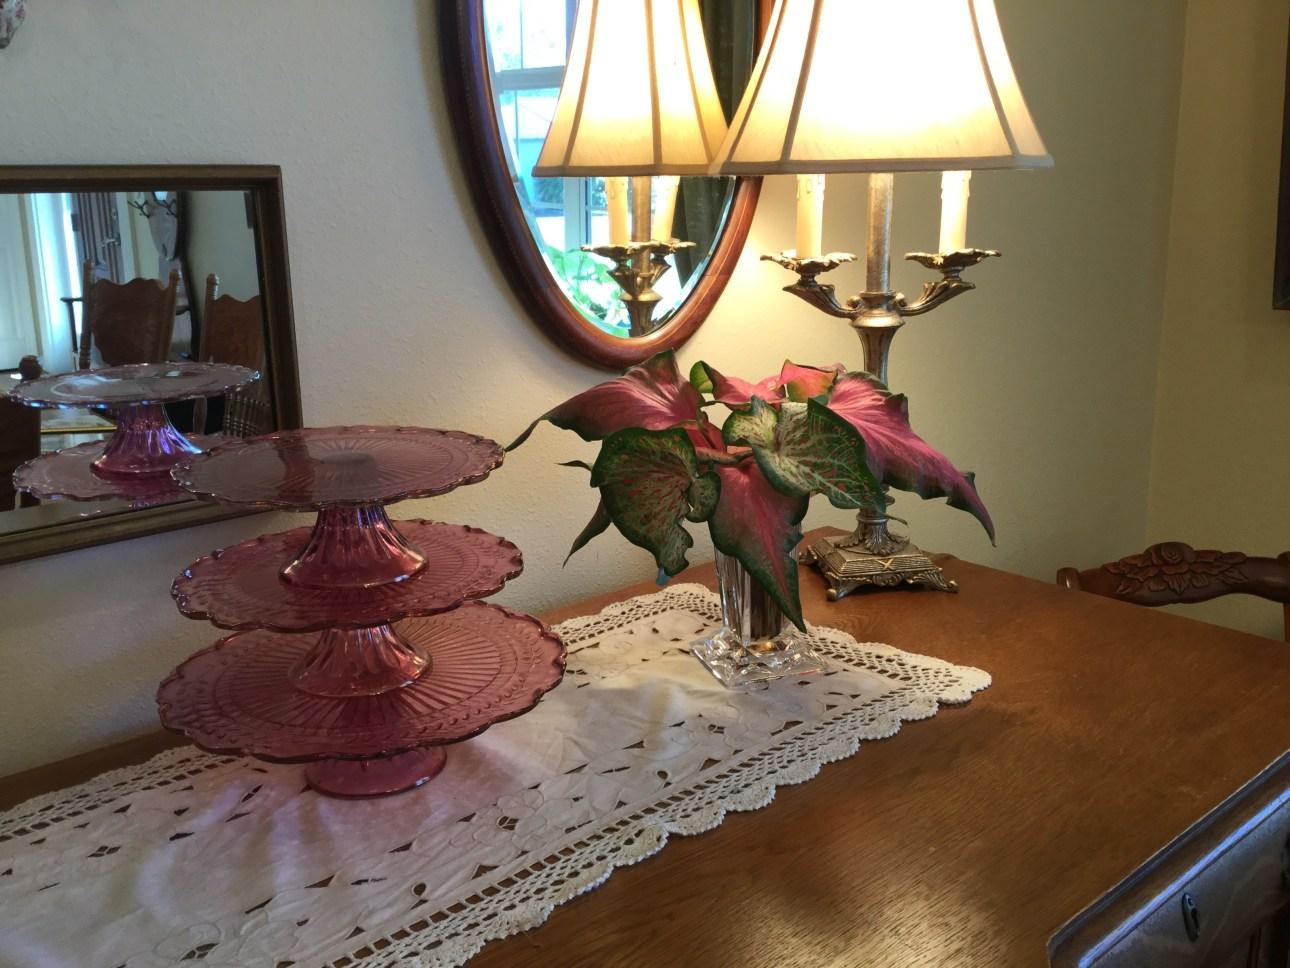 Floral Arrangements of Lance Leaf Caladiums